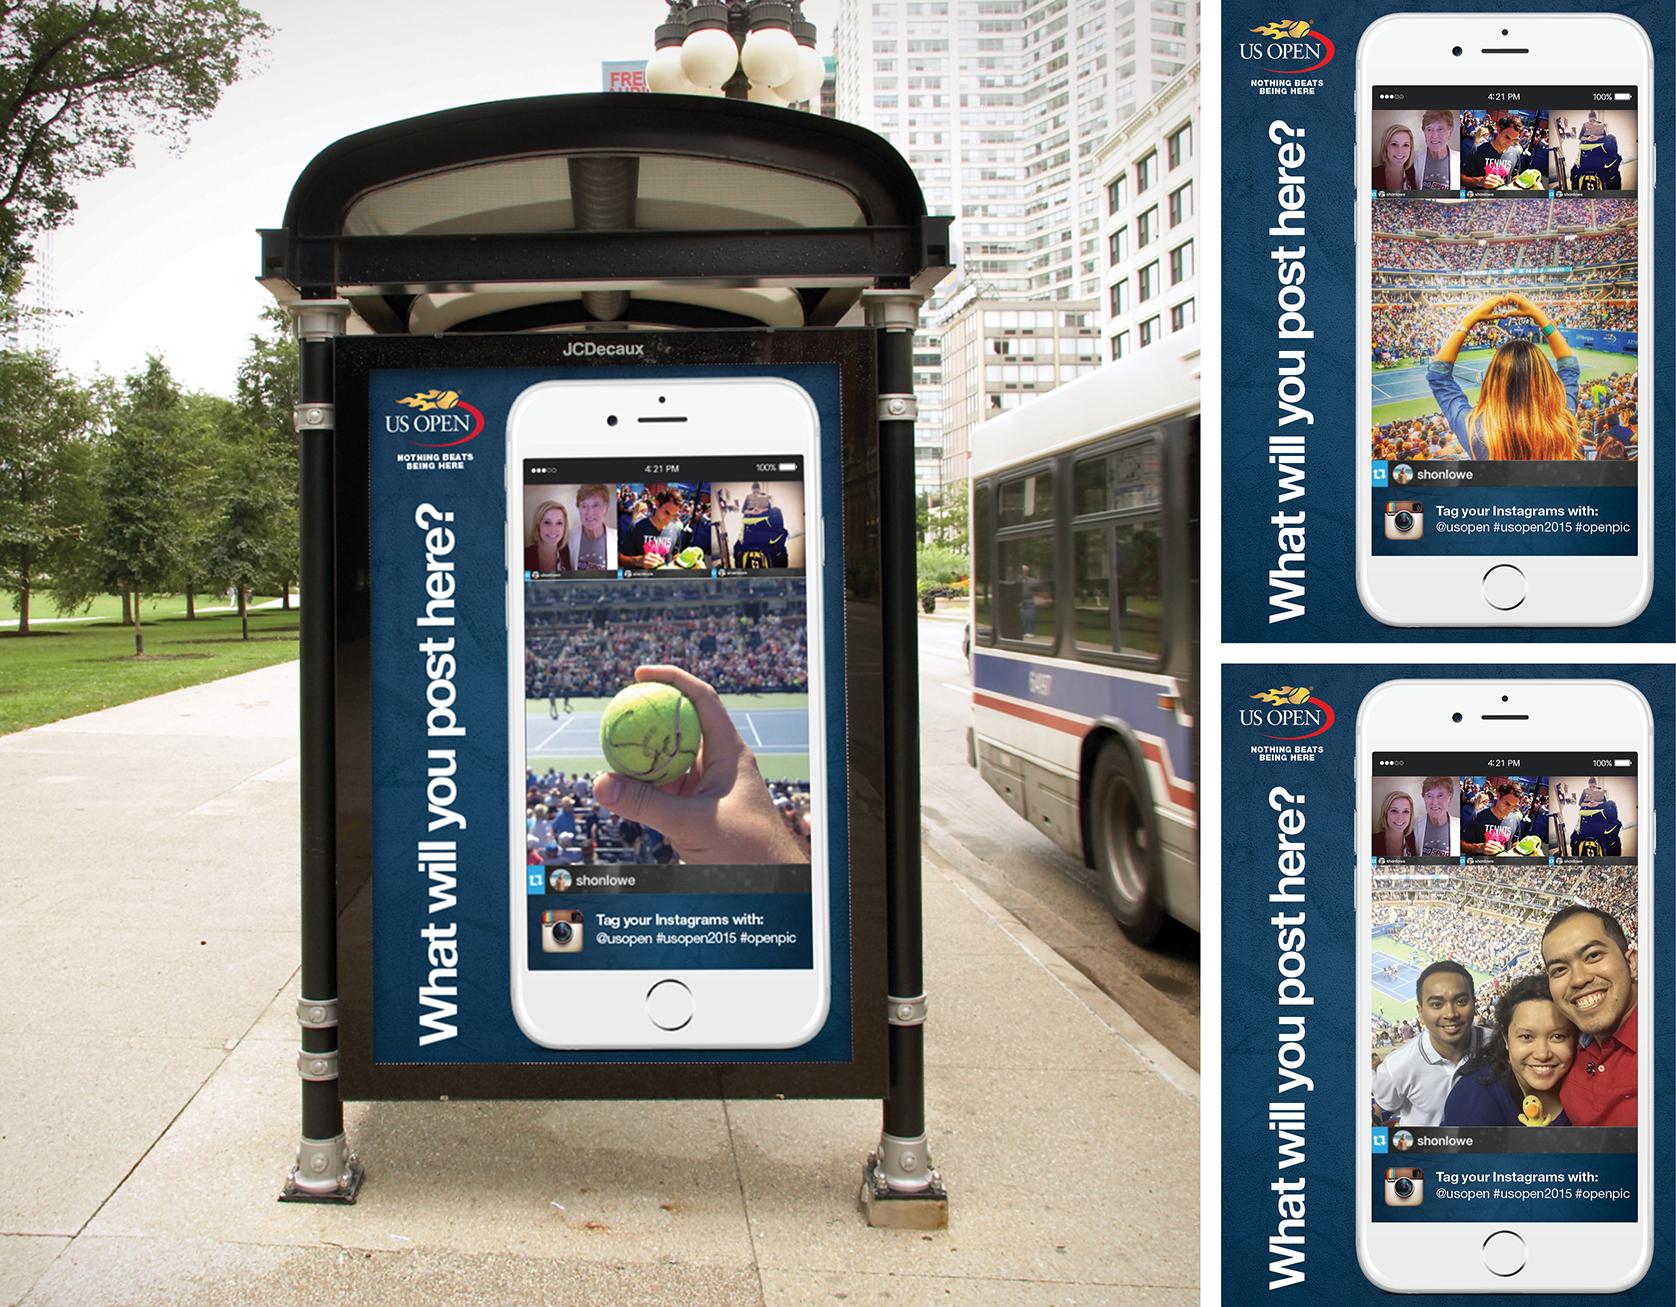 USOpen2015_OOH_BusShelter